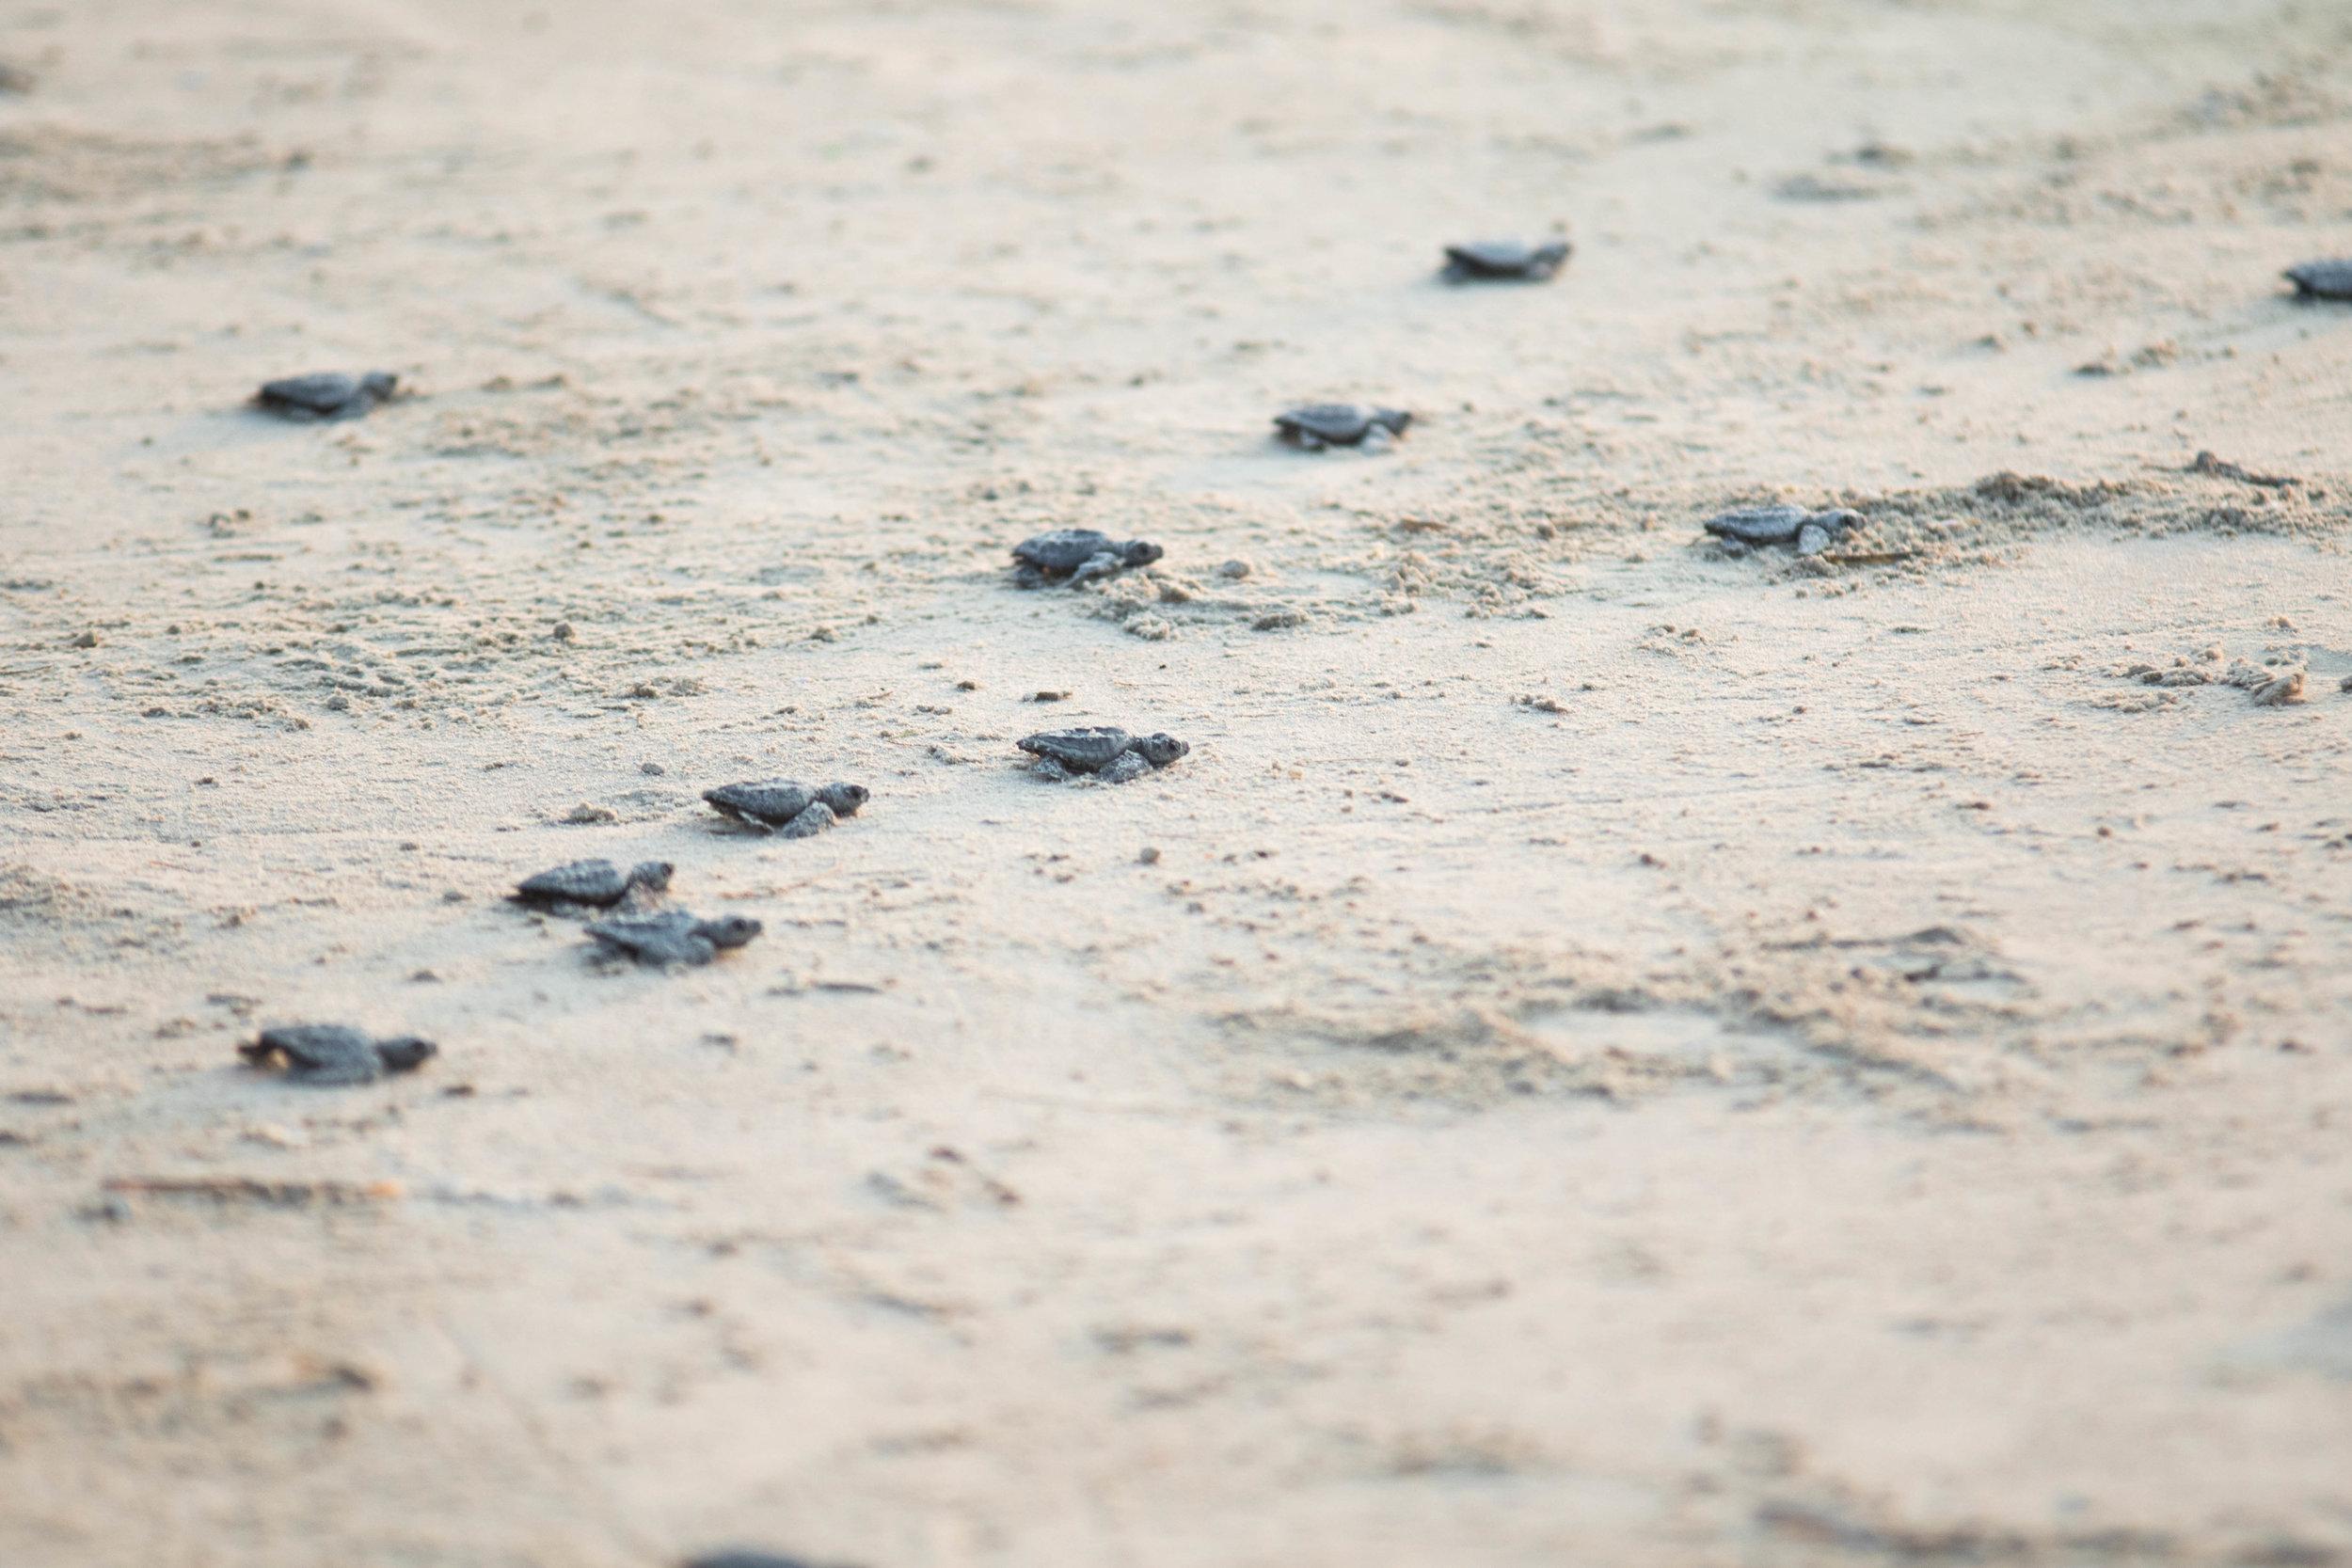 turtle-release-texas-photos-by-samantha-look.jpg